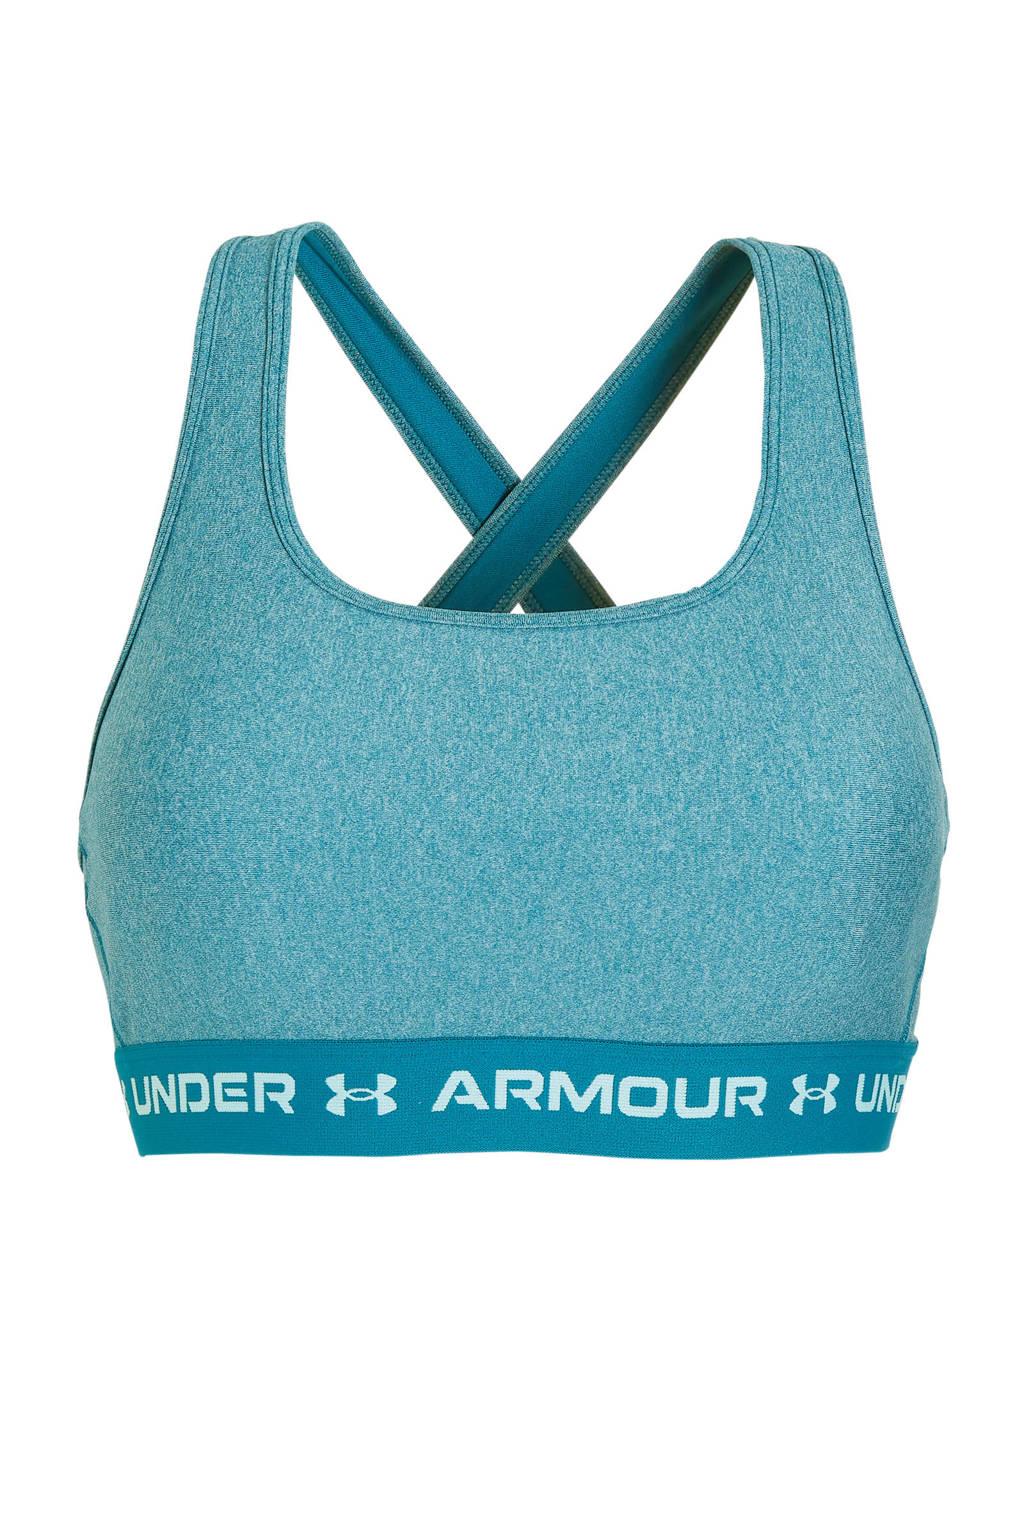 Under Armour level 1 sportbh blauw, Blauw